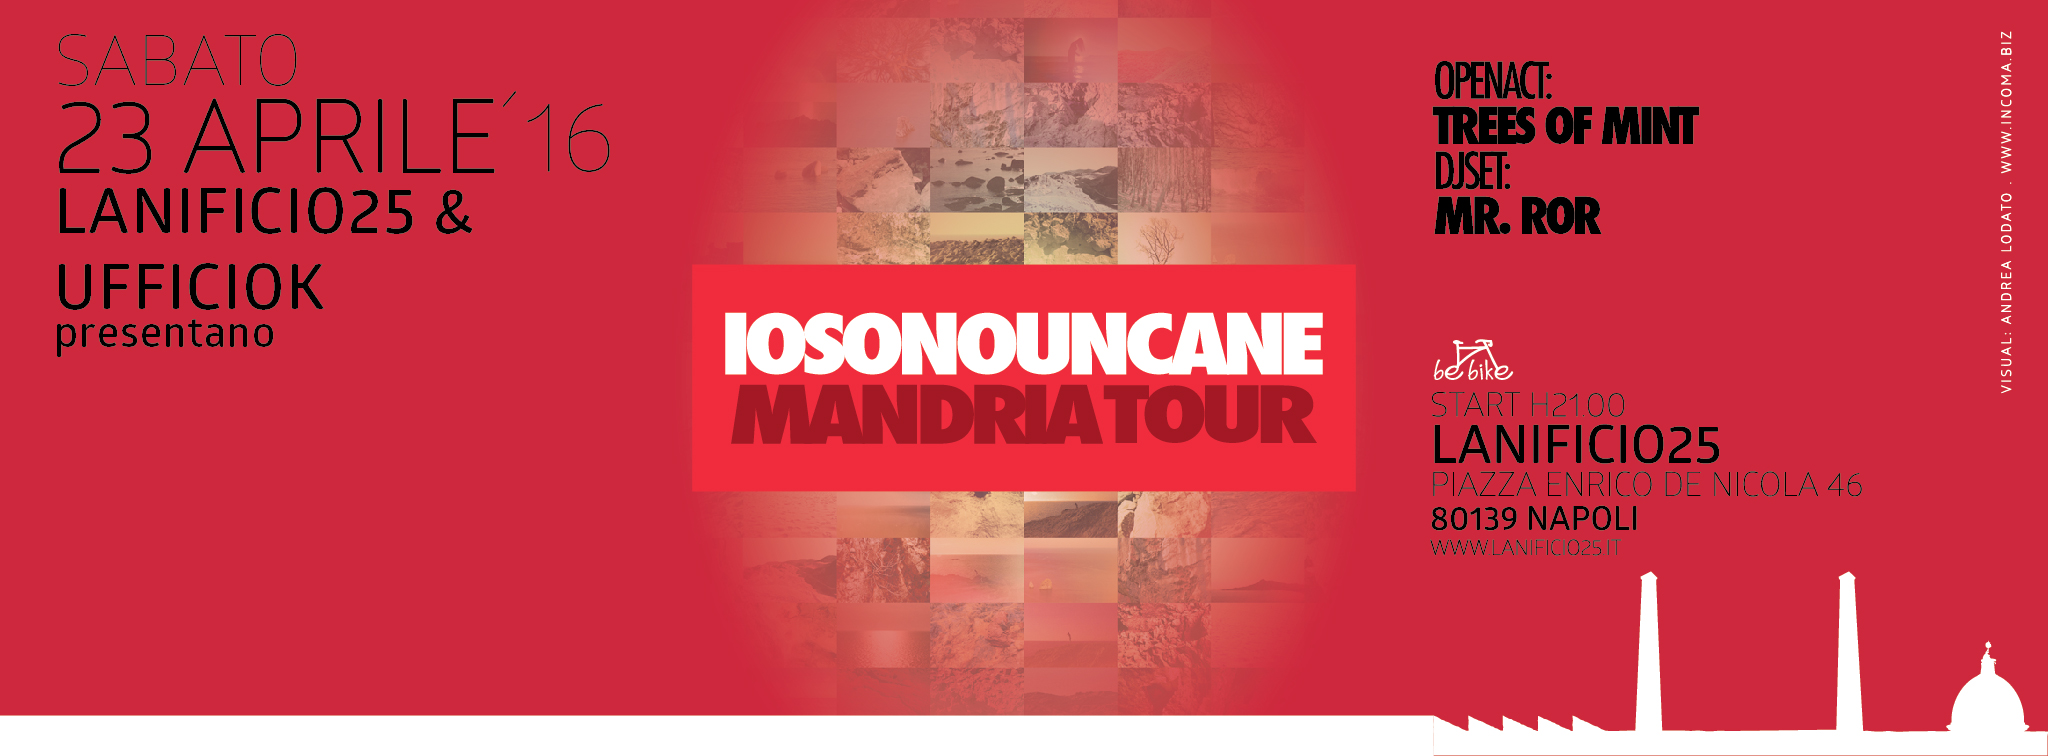 iosonouncane-lanificio-25